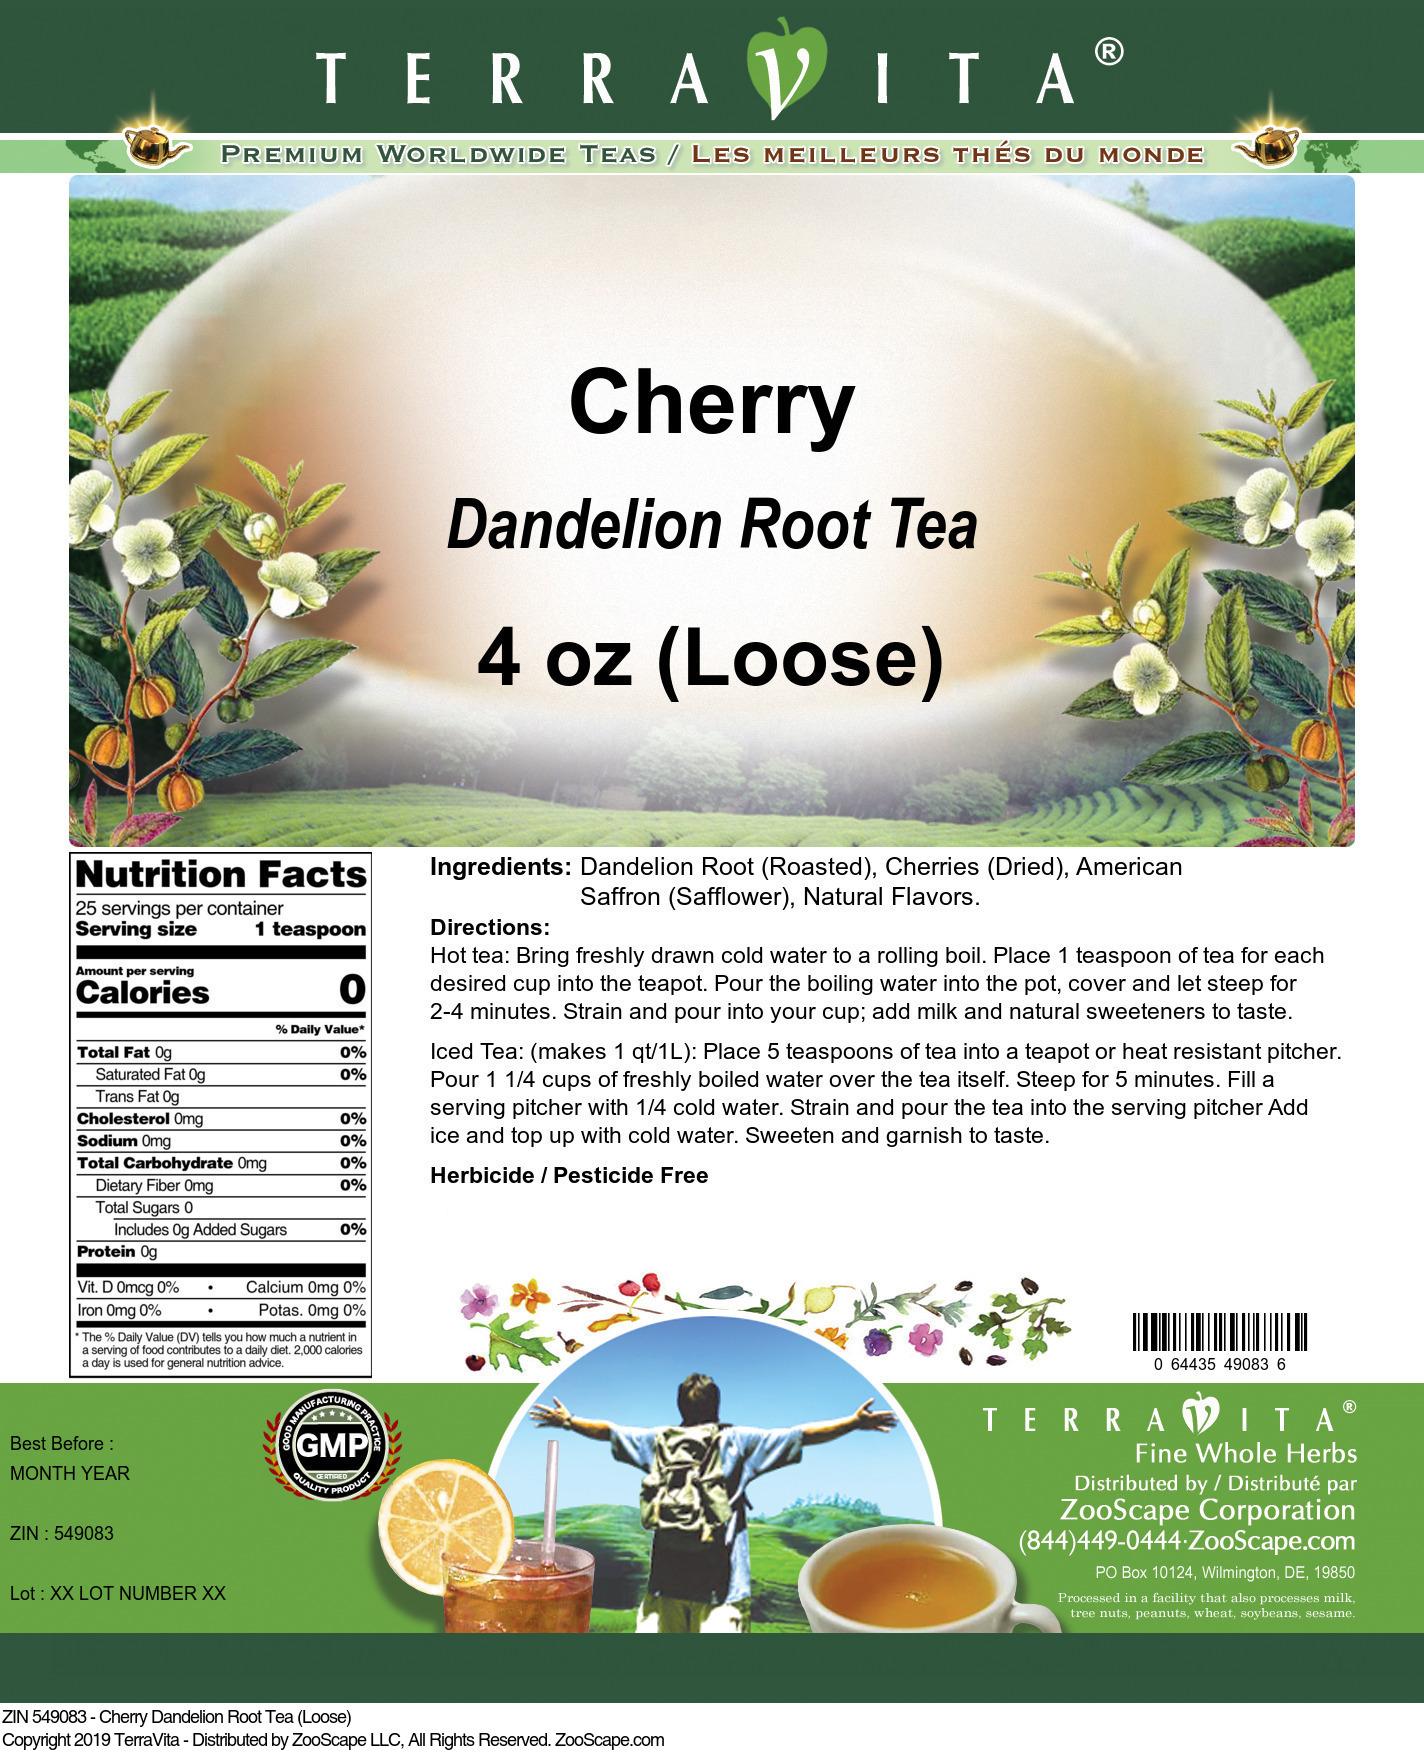 Cherry Dandelion Root